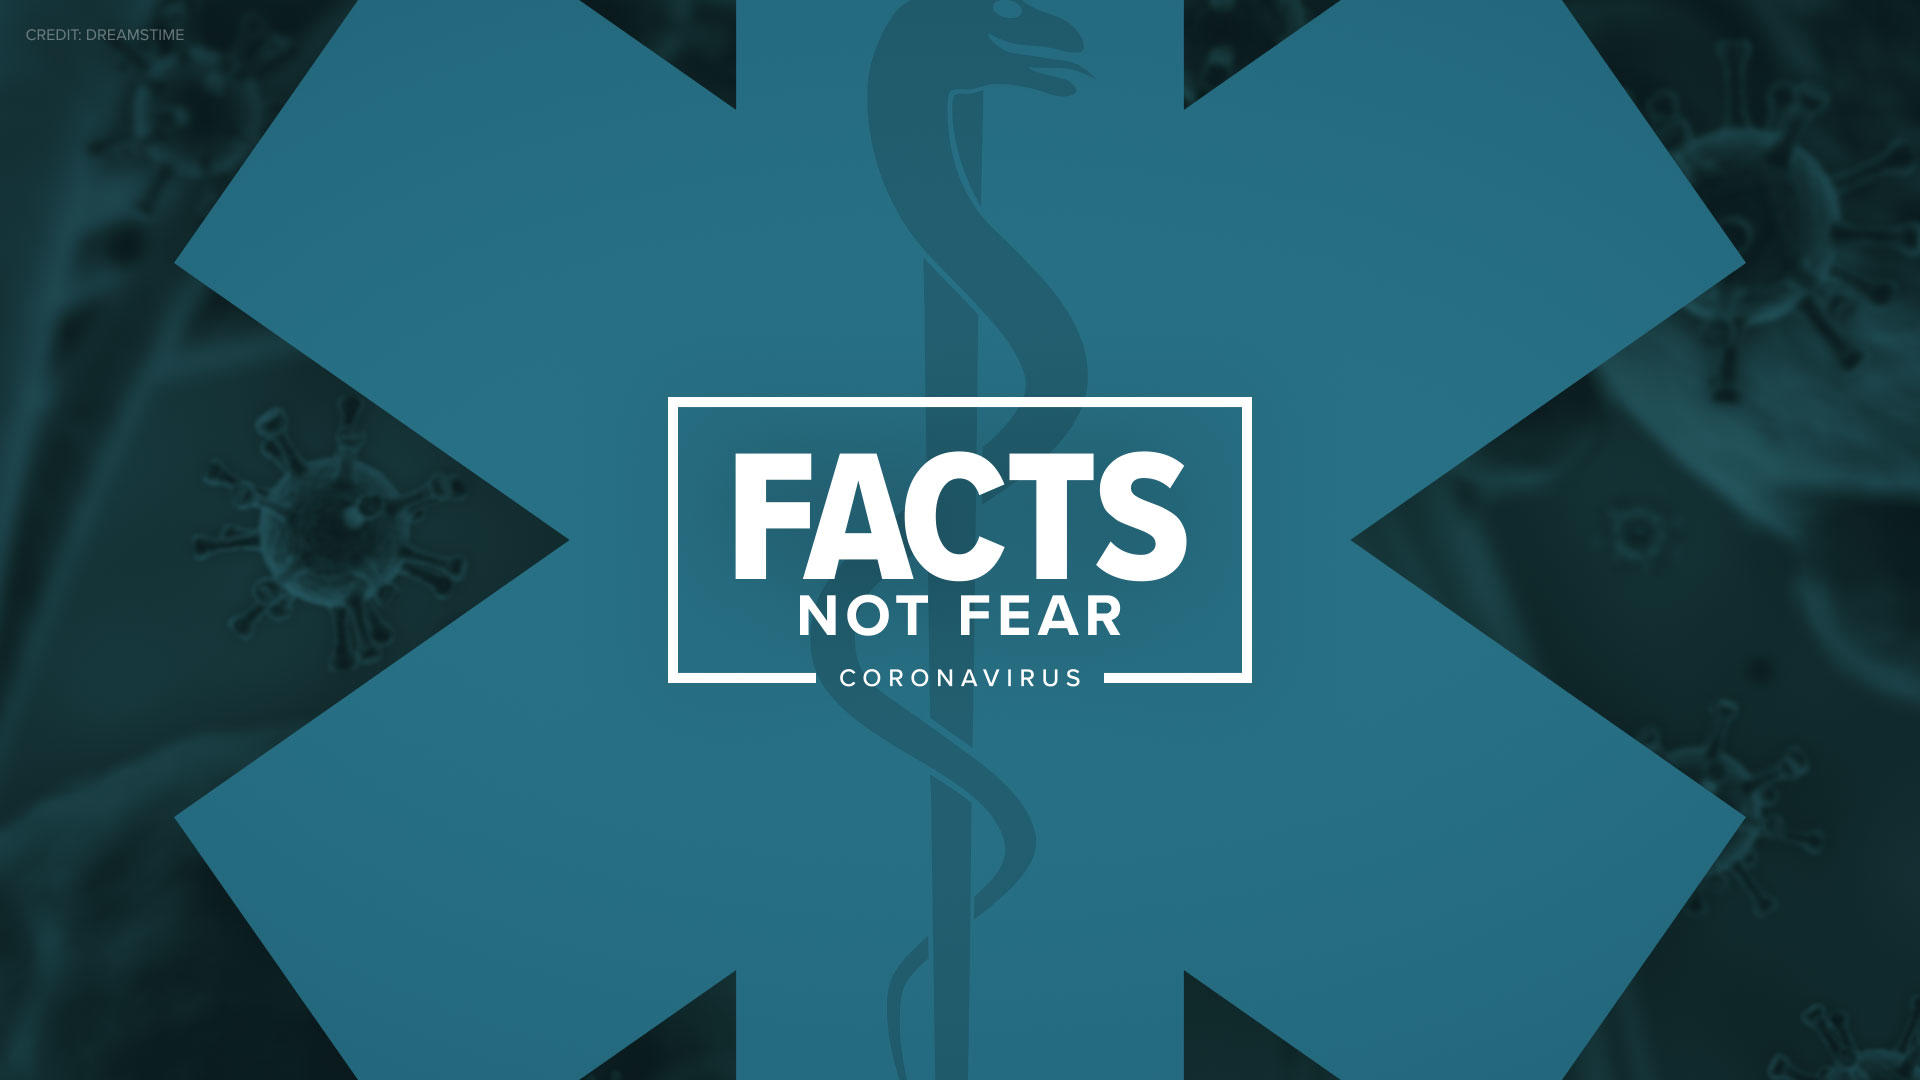 COVID19 FactsNotFear